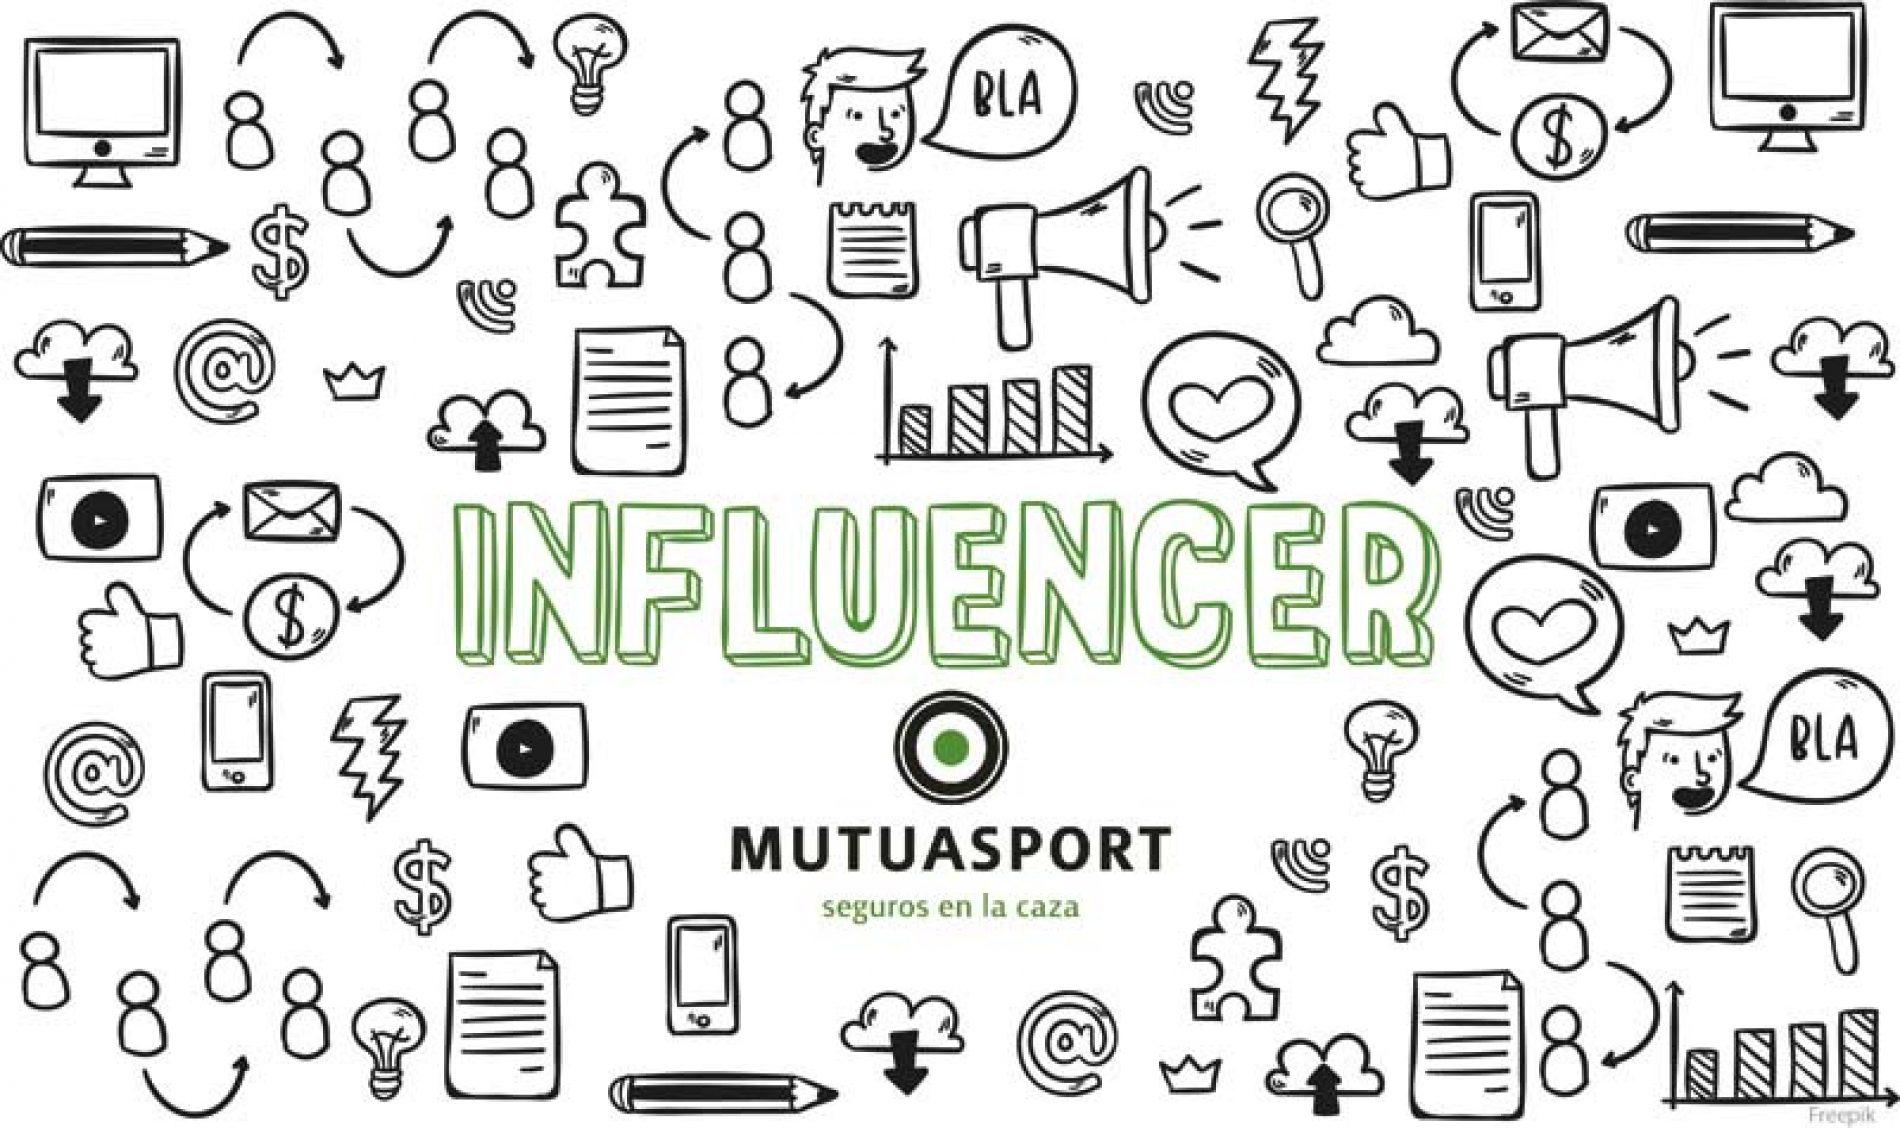 Stop a los Accidentes de Caza – Influencers Mutuasport